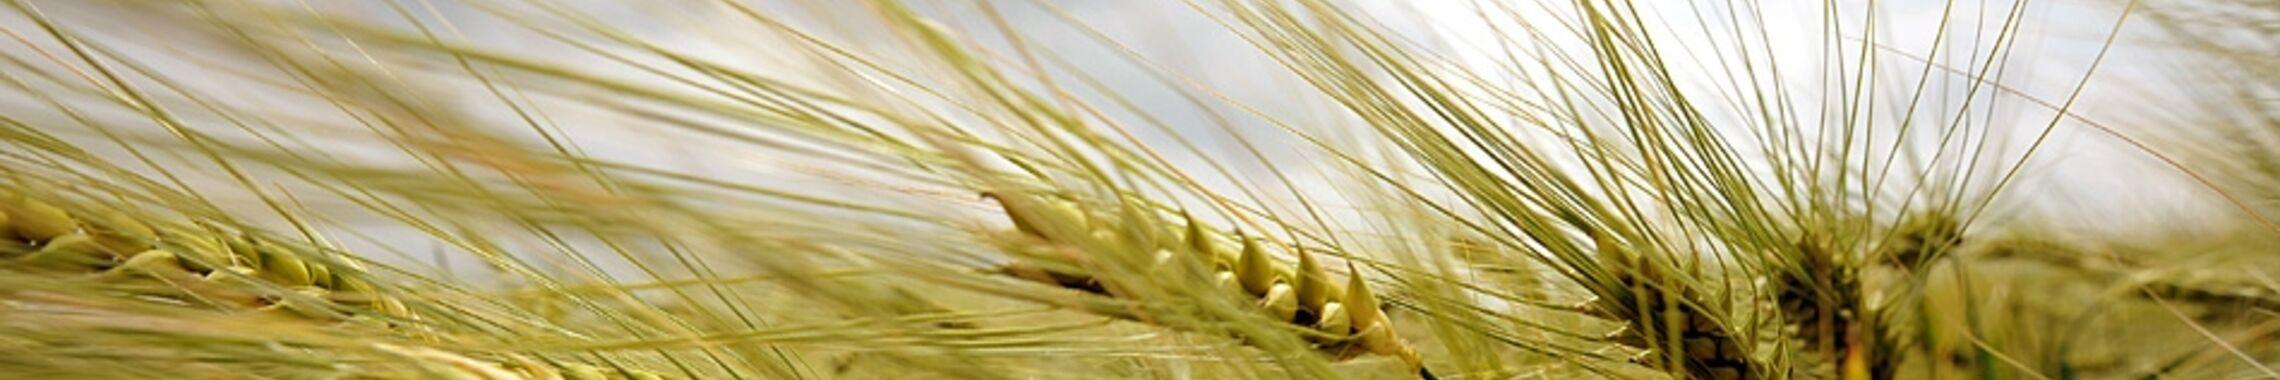 Nahaufnahme: Weizen-Ähren